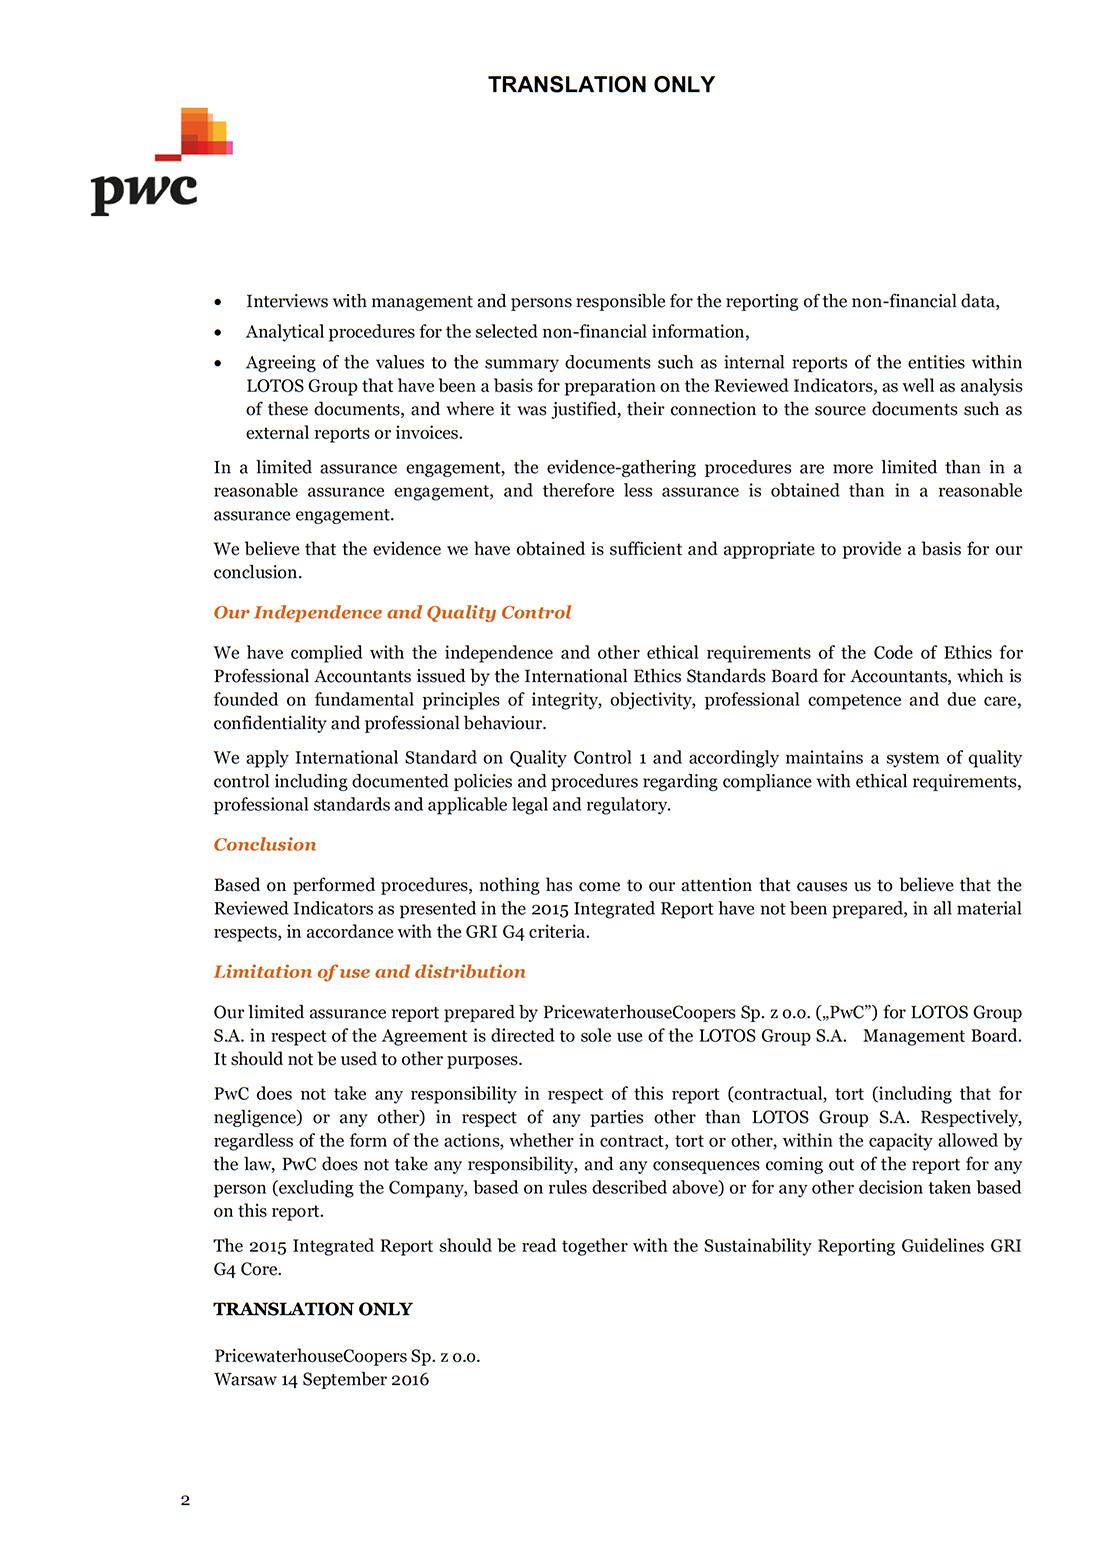 Assurance letter - page 2